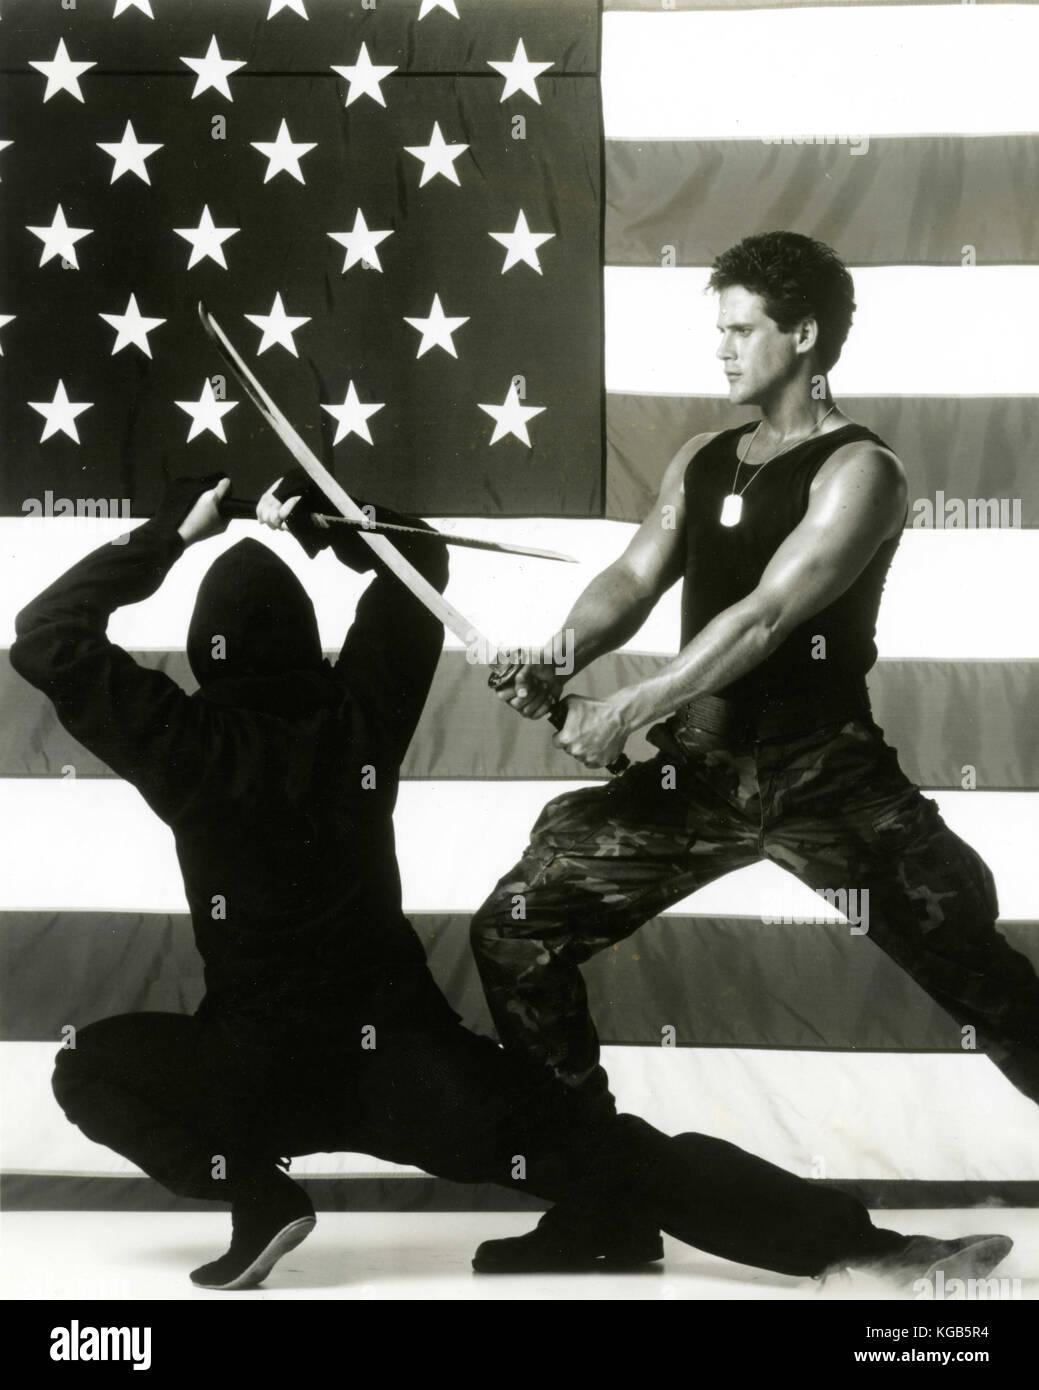 L'acteur Michael Dudikoff dans le Ninja américain film, 1985 Photo Stock